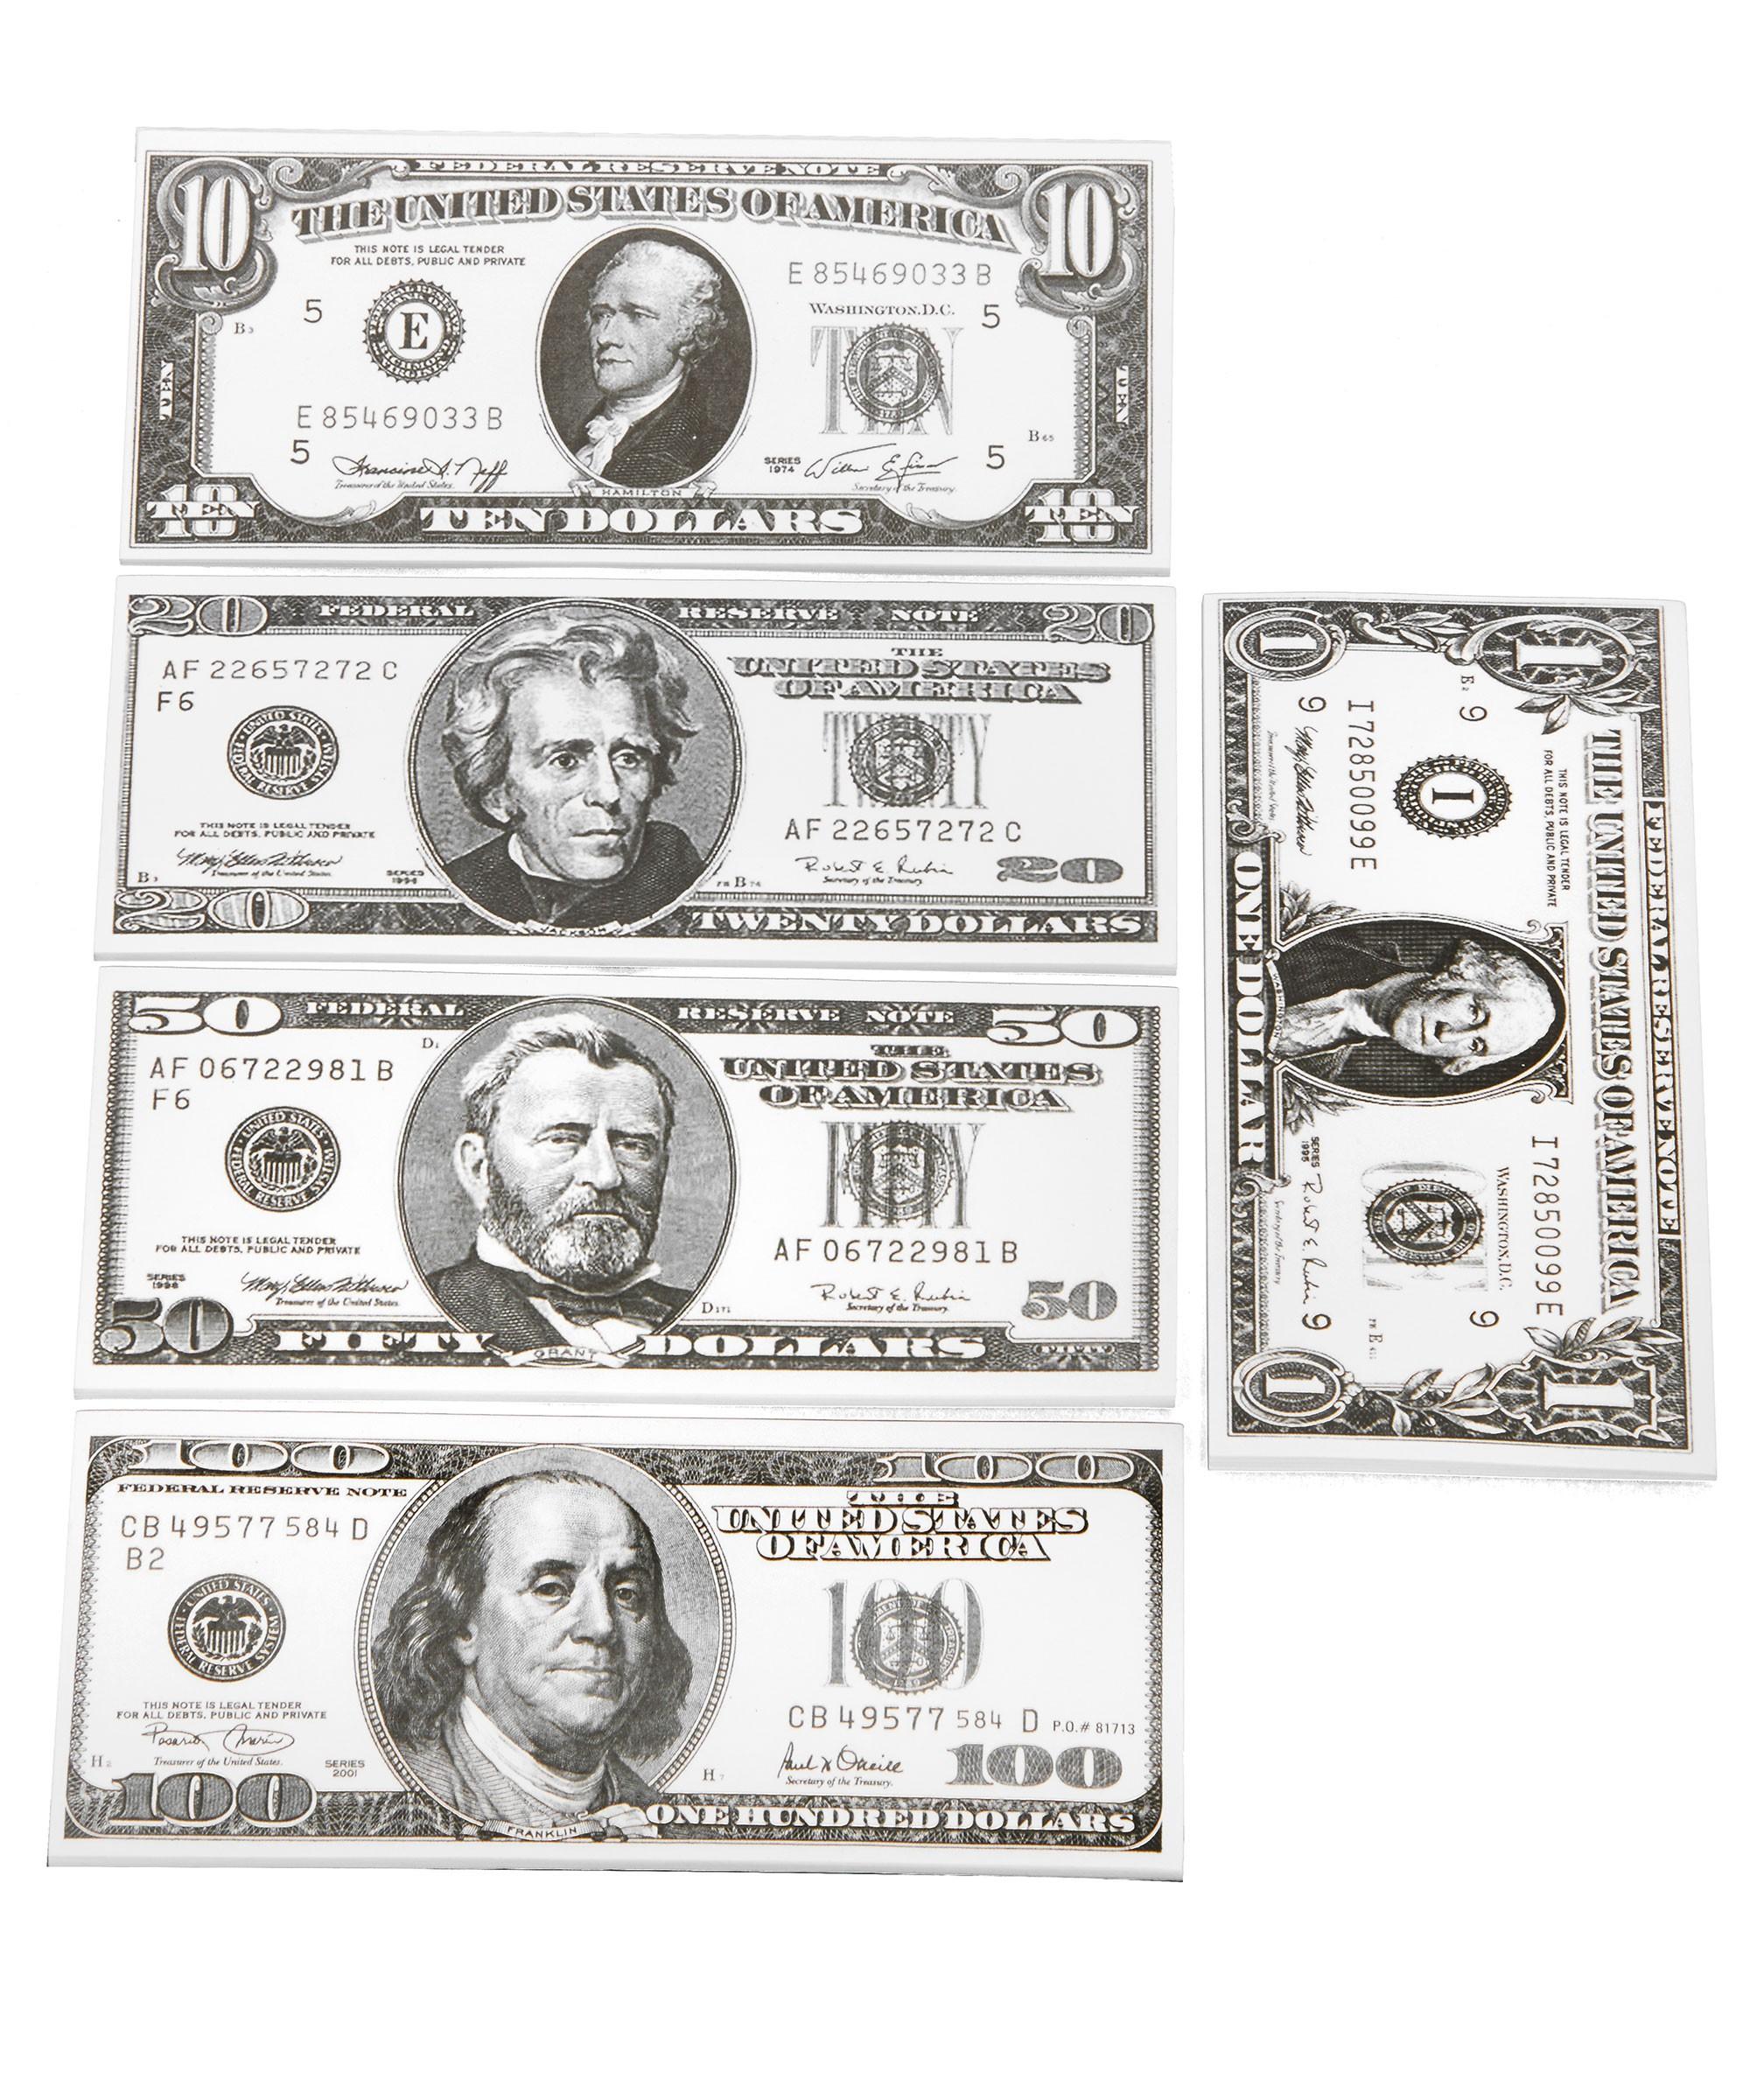 Argent Factice (Billets Dollars) concernant Argent Factice À Imprimer